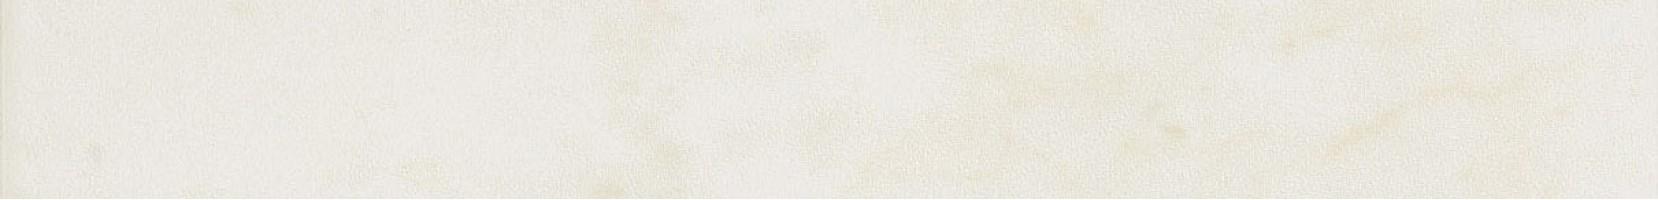 Бордюр Italon Charme Pearl Listello 7.2x60 610090000726